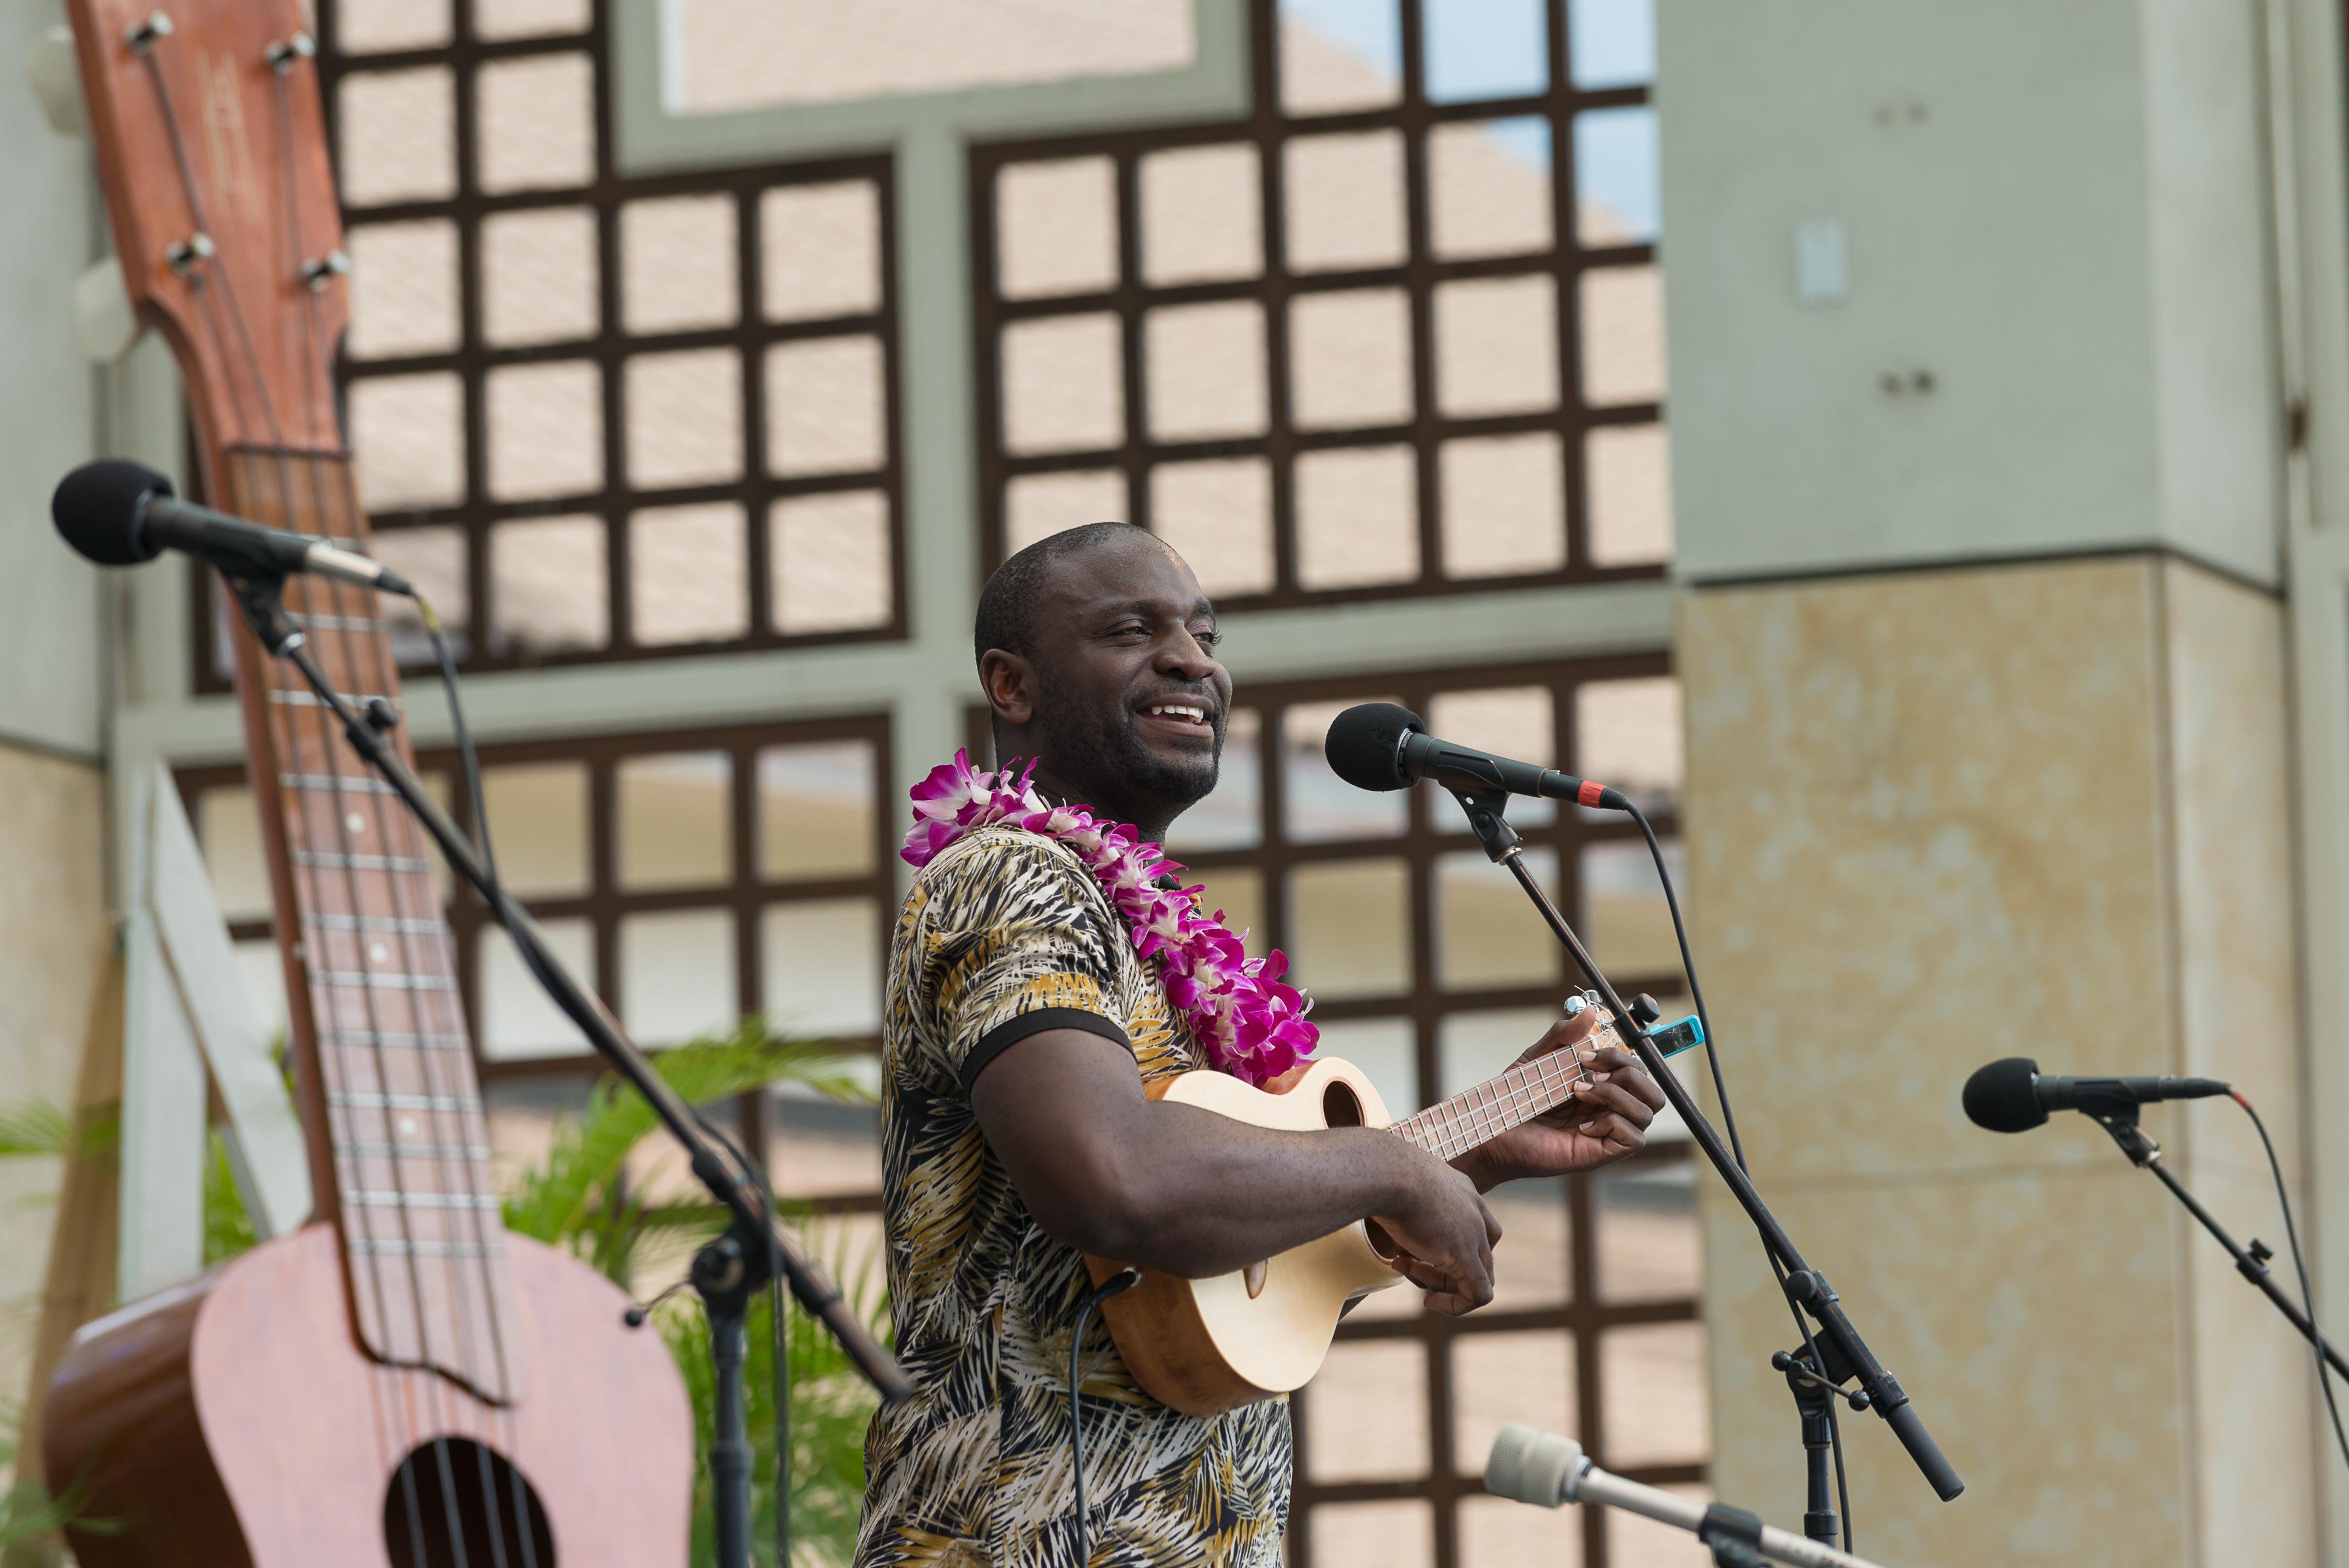 11th Annual Maui 'Ukulele Festival. PC: Kamakakehau Fernandez, credit Aubrey Hord Photography.